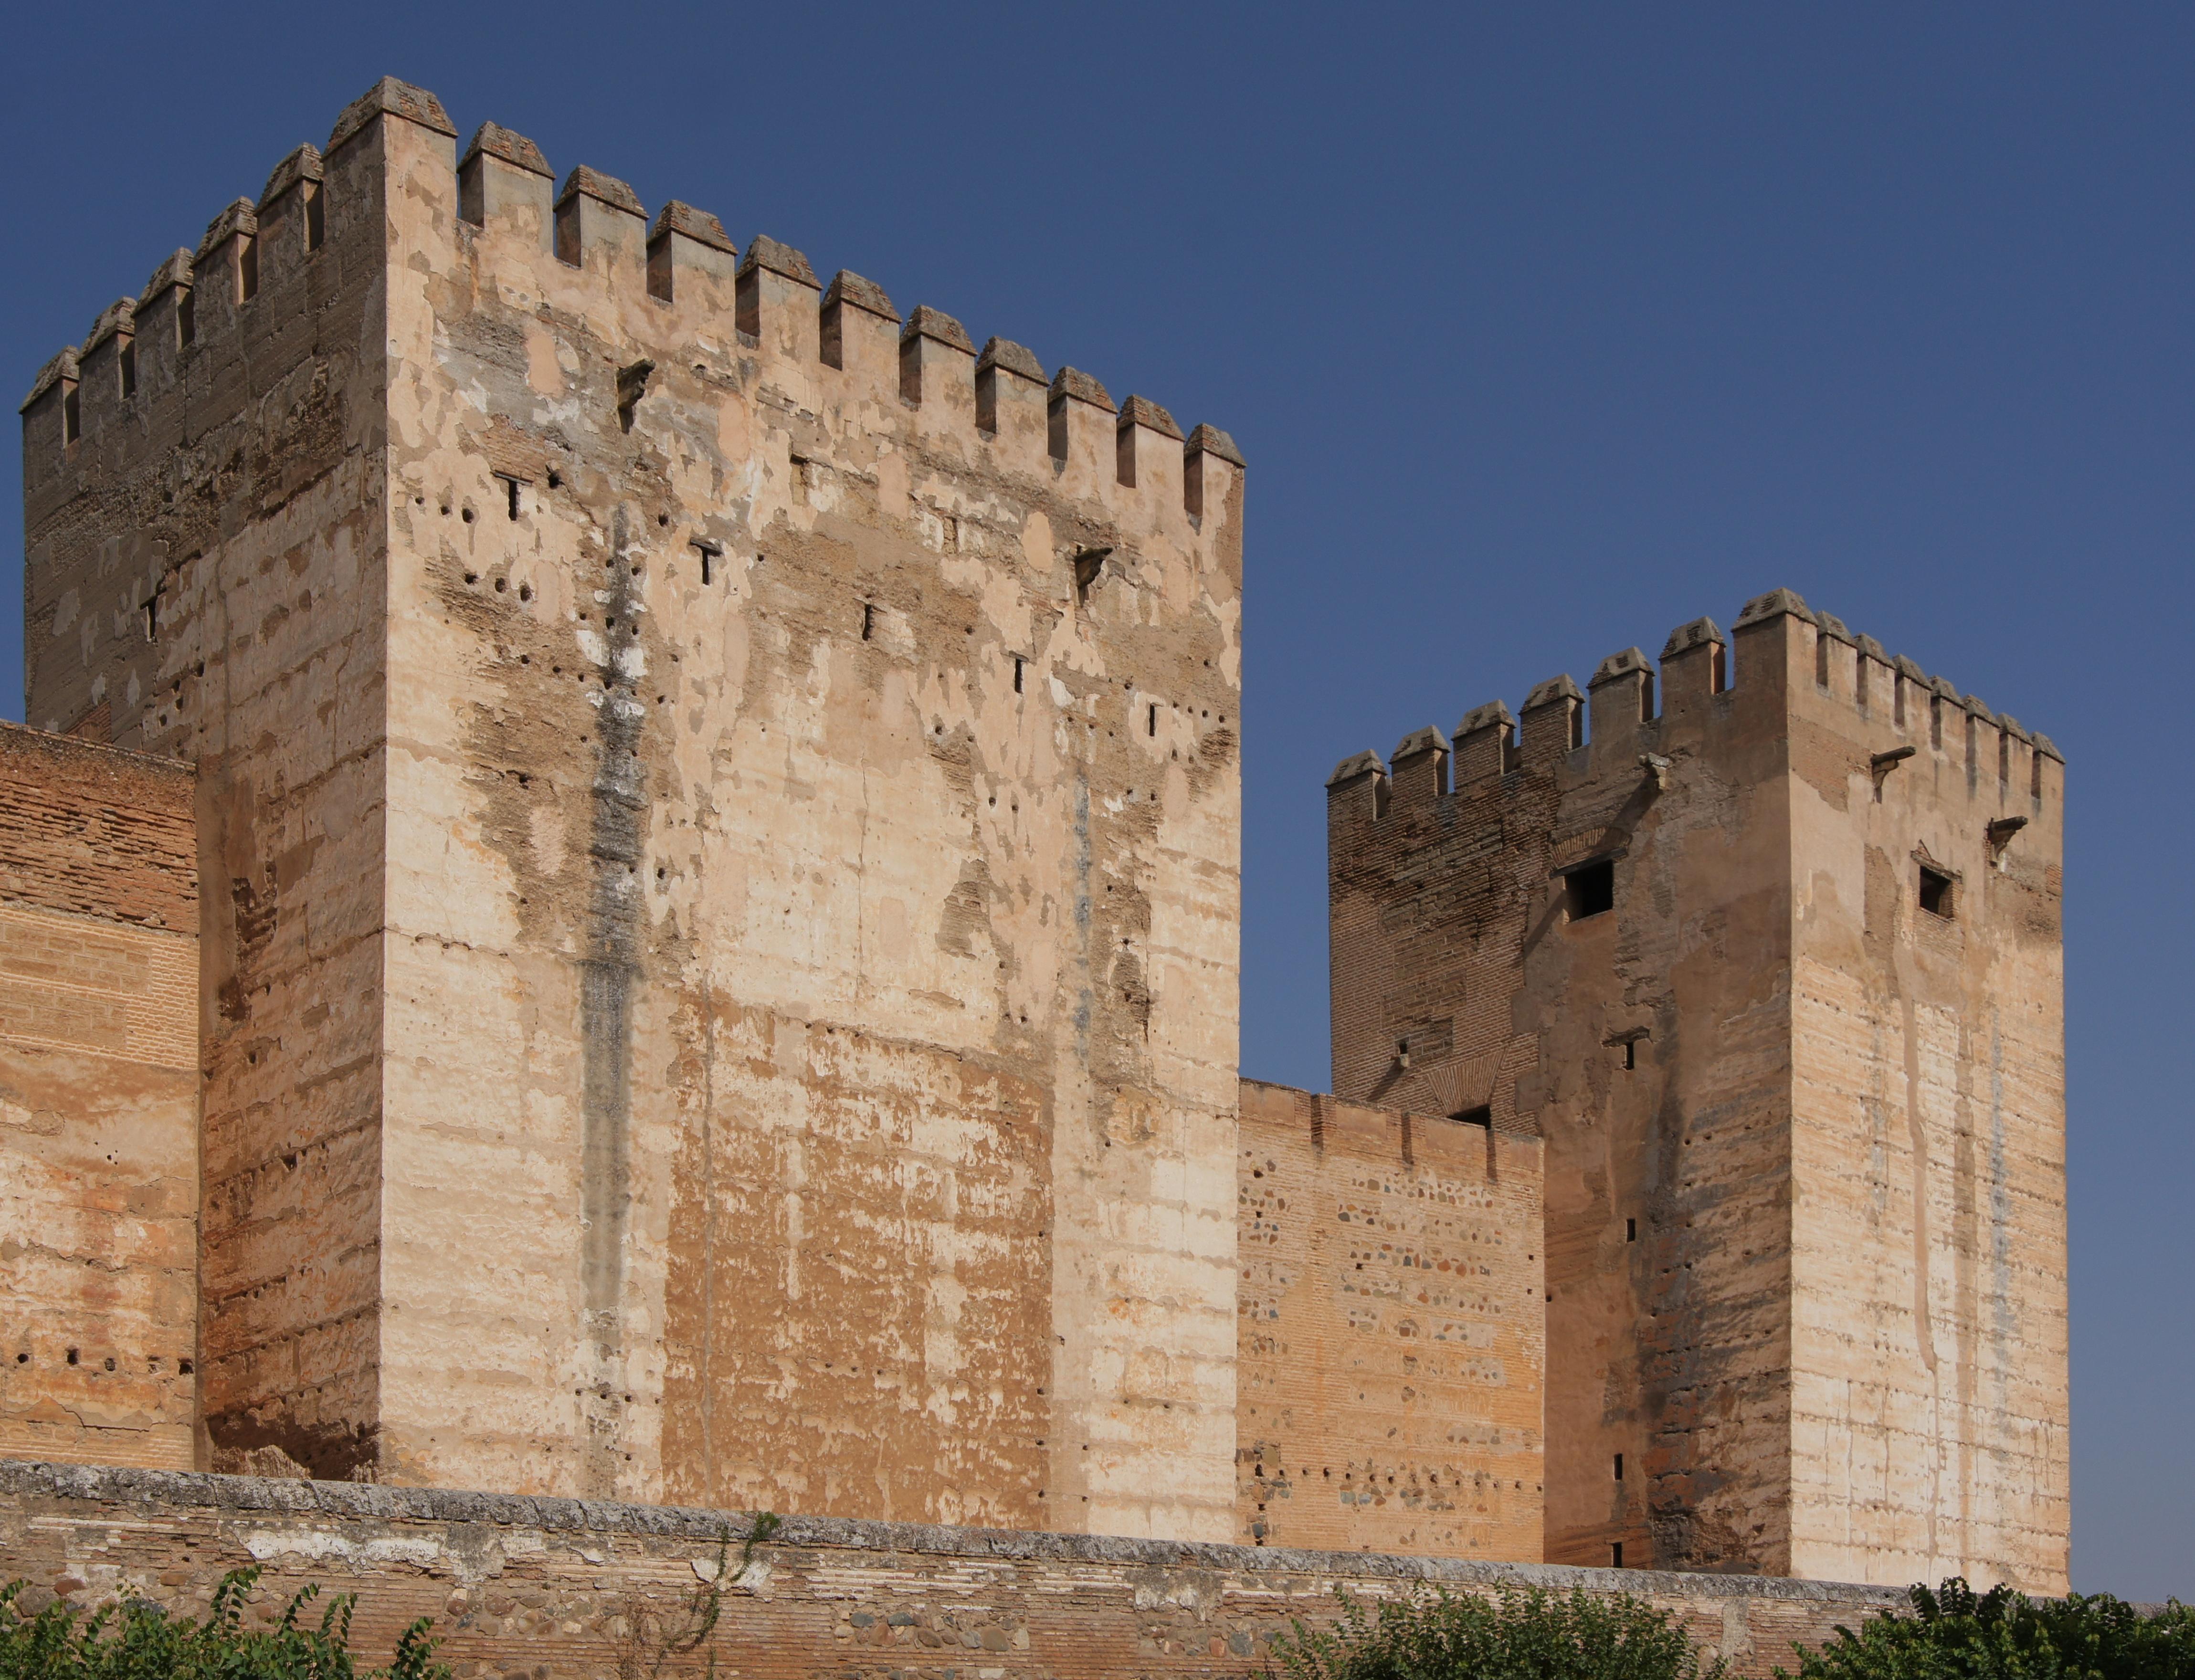 File:Alhambra alcazaba tours.jpg - Wikimedia Commons